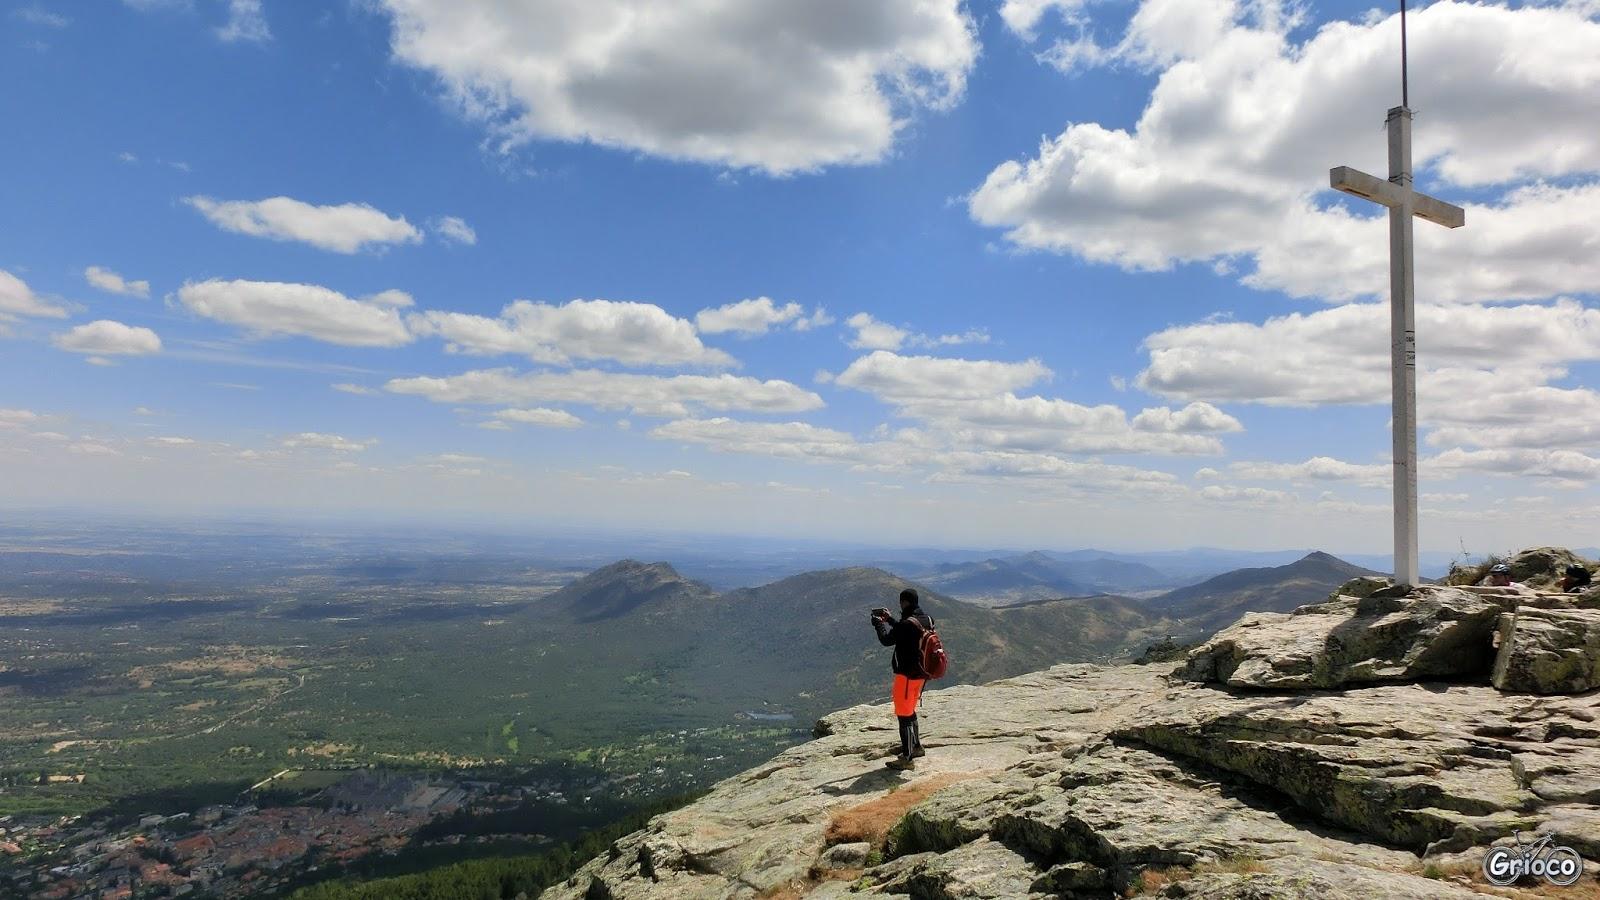 Imprescindibles para preparar tu ruta a la montaña